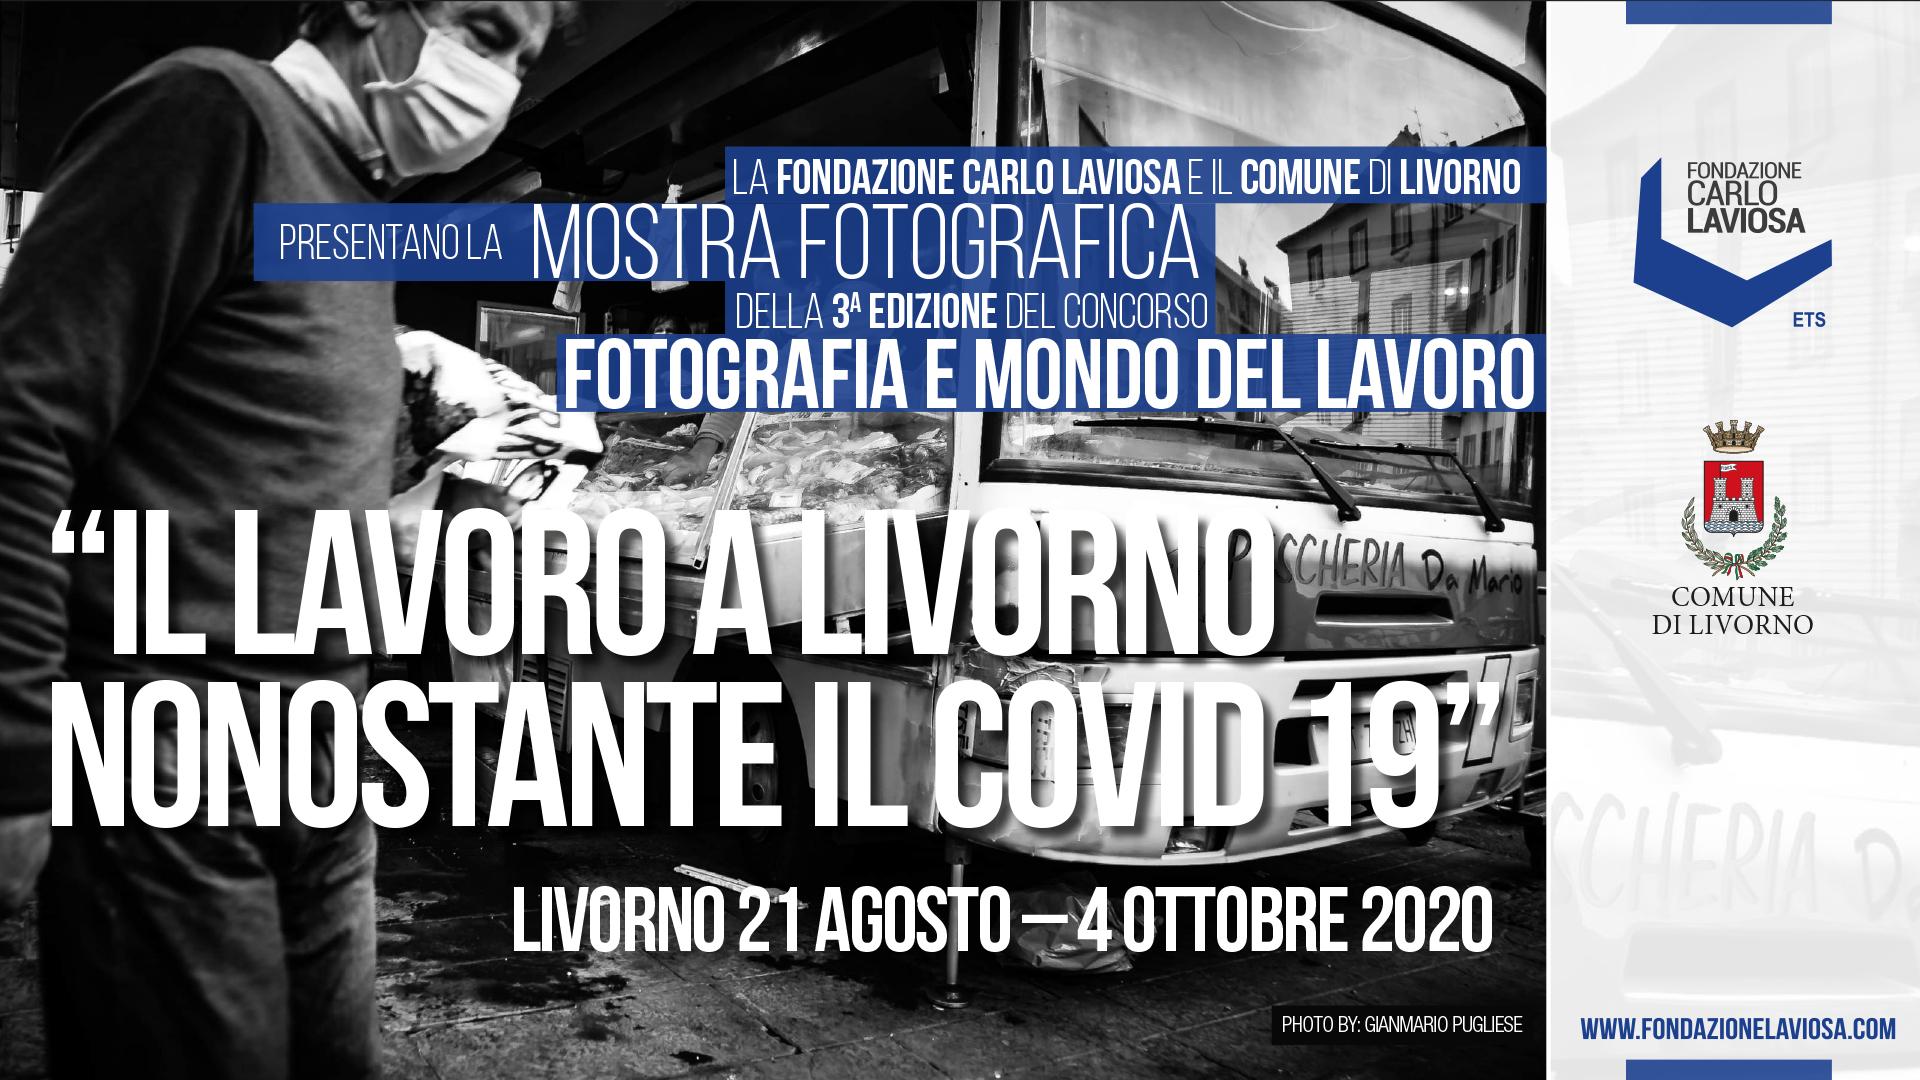 FACEBOOK COVEREVENTO